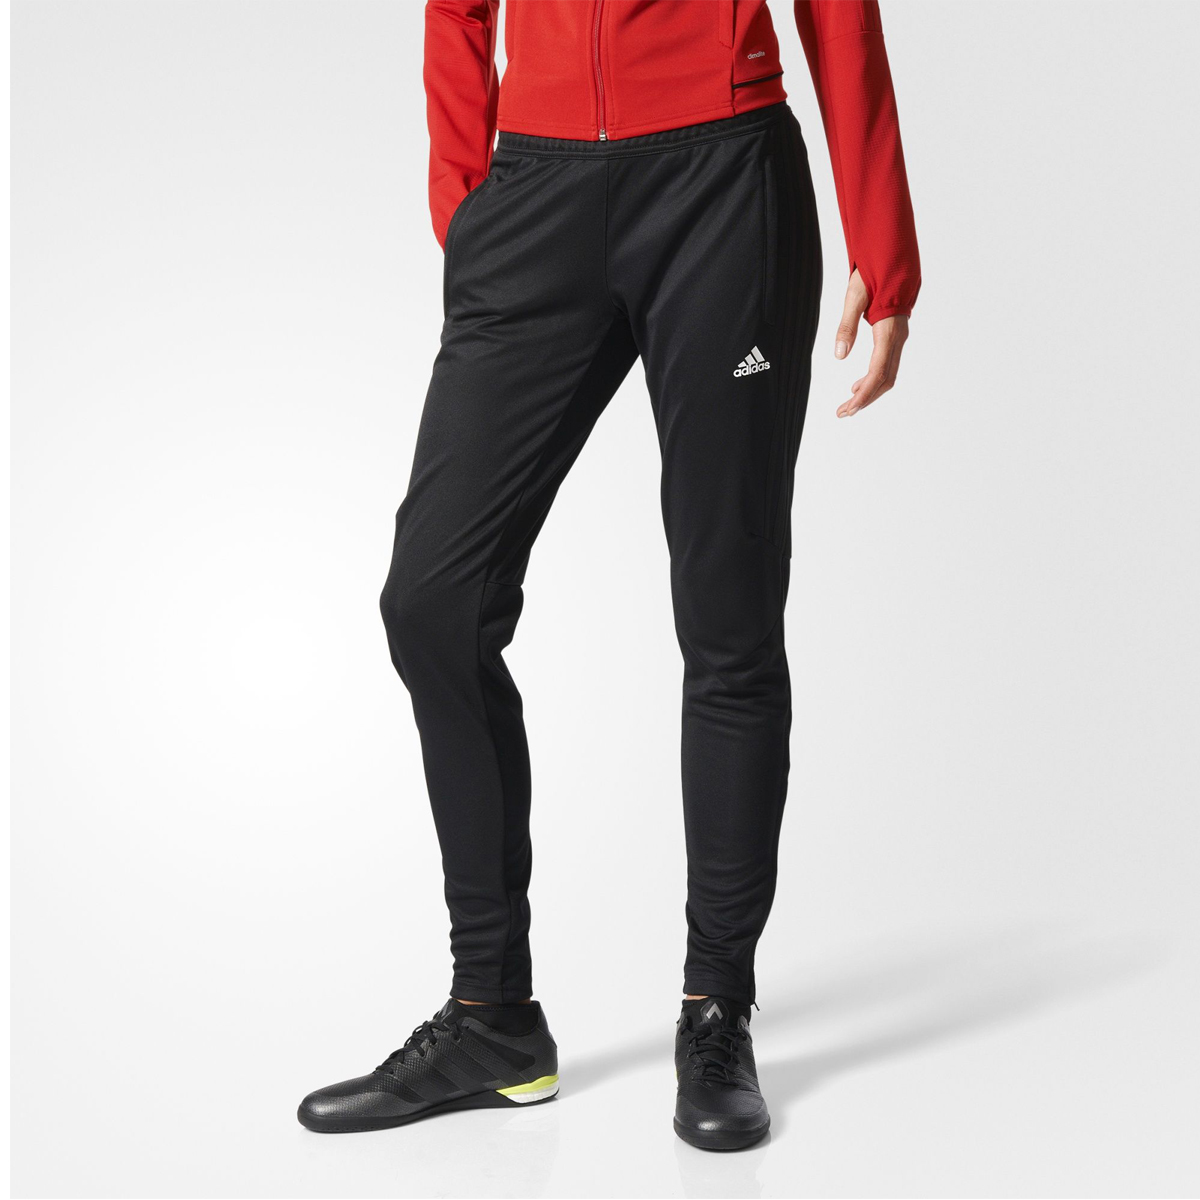 Adidas Tiro 17 Dames Trainingsbroek